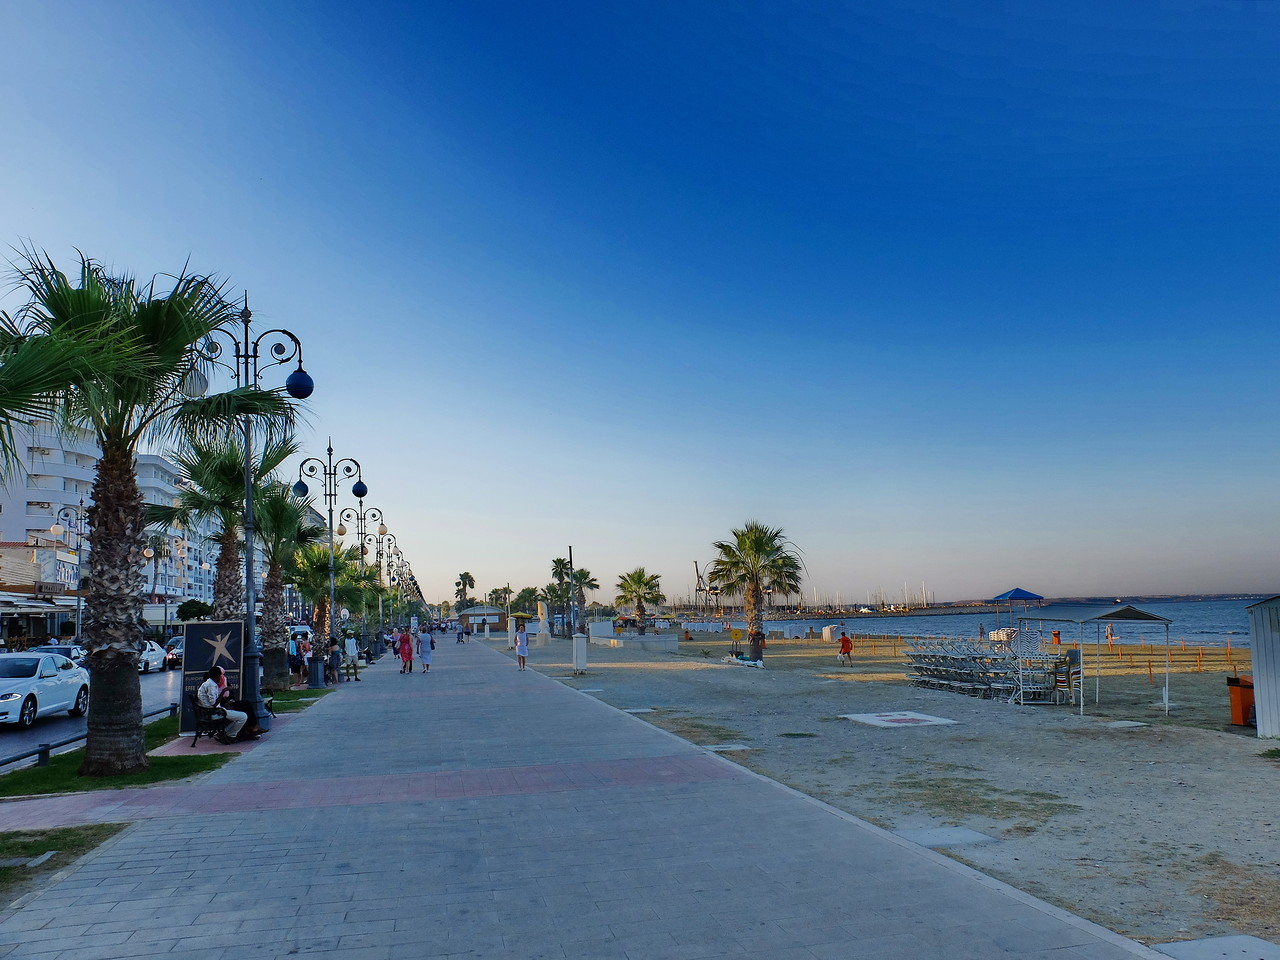 Larnaca weather 2017: weather forecast for the region of larnaca in cyprus - temperatureweathercom